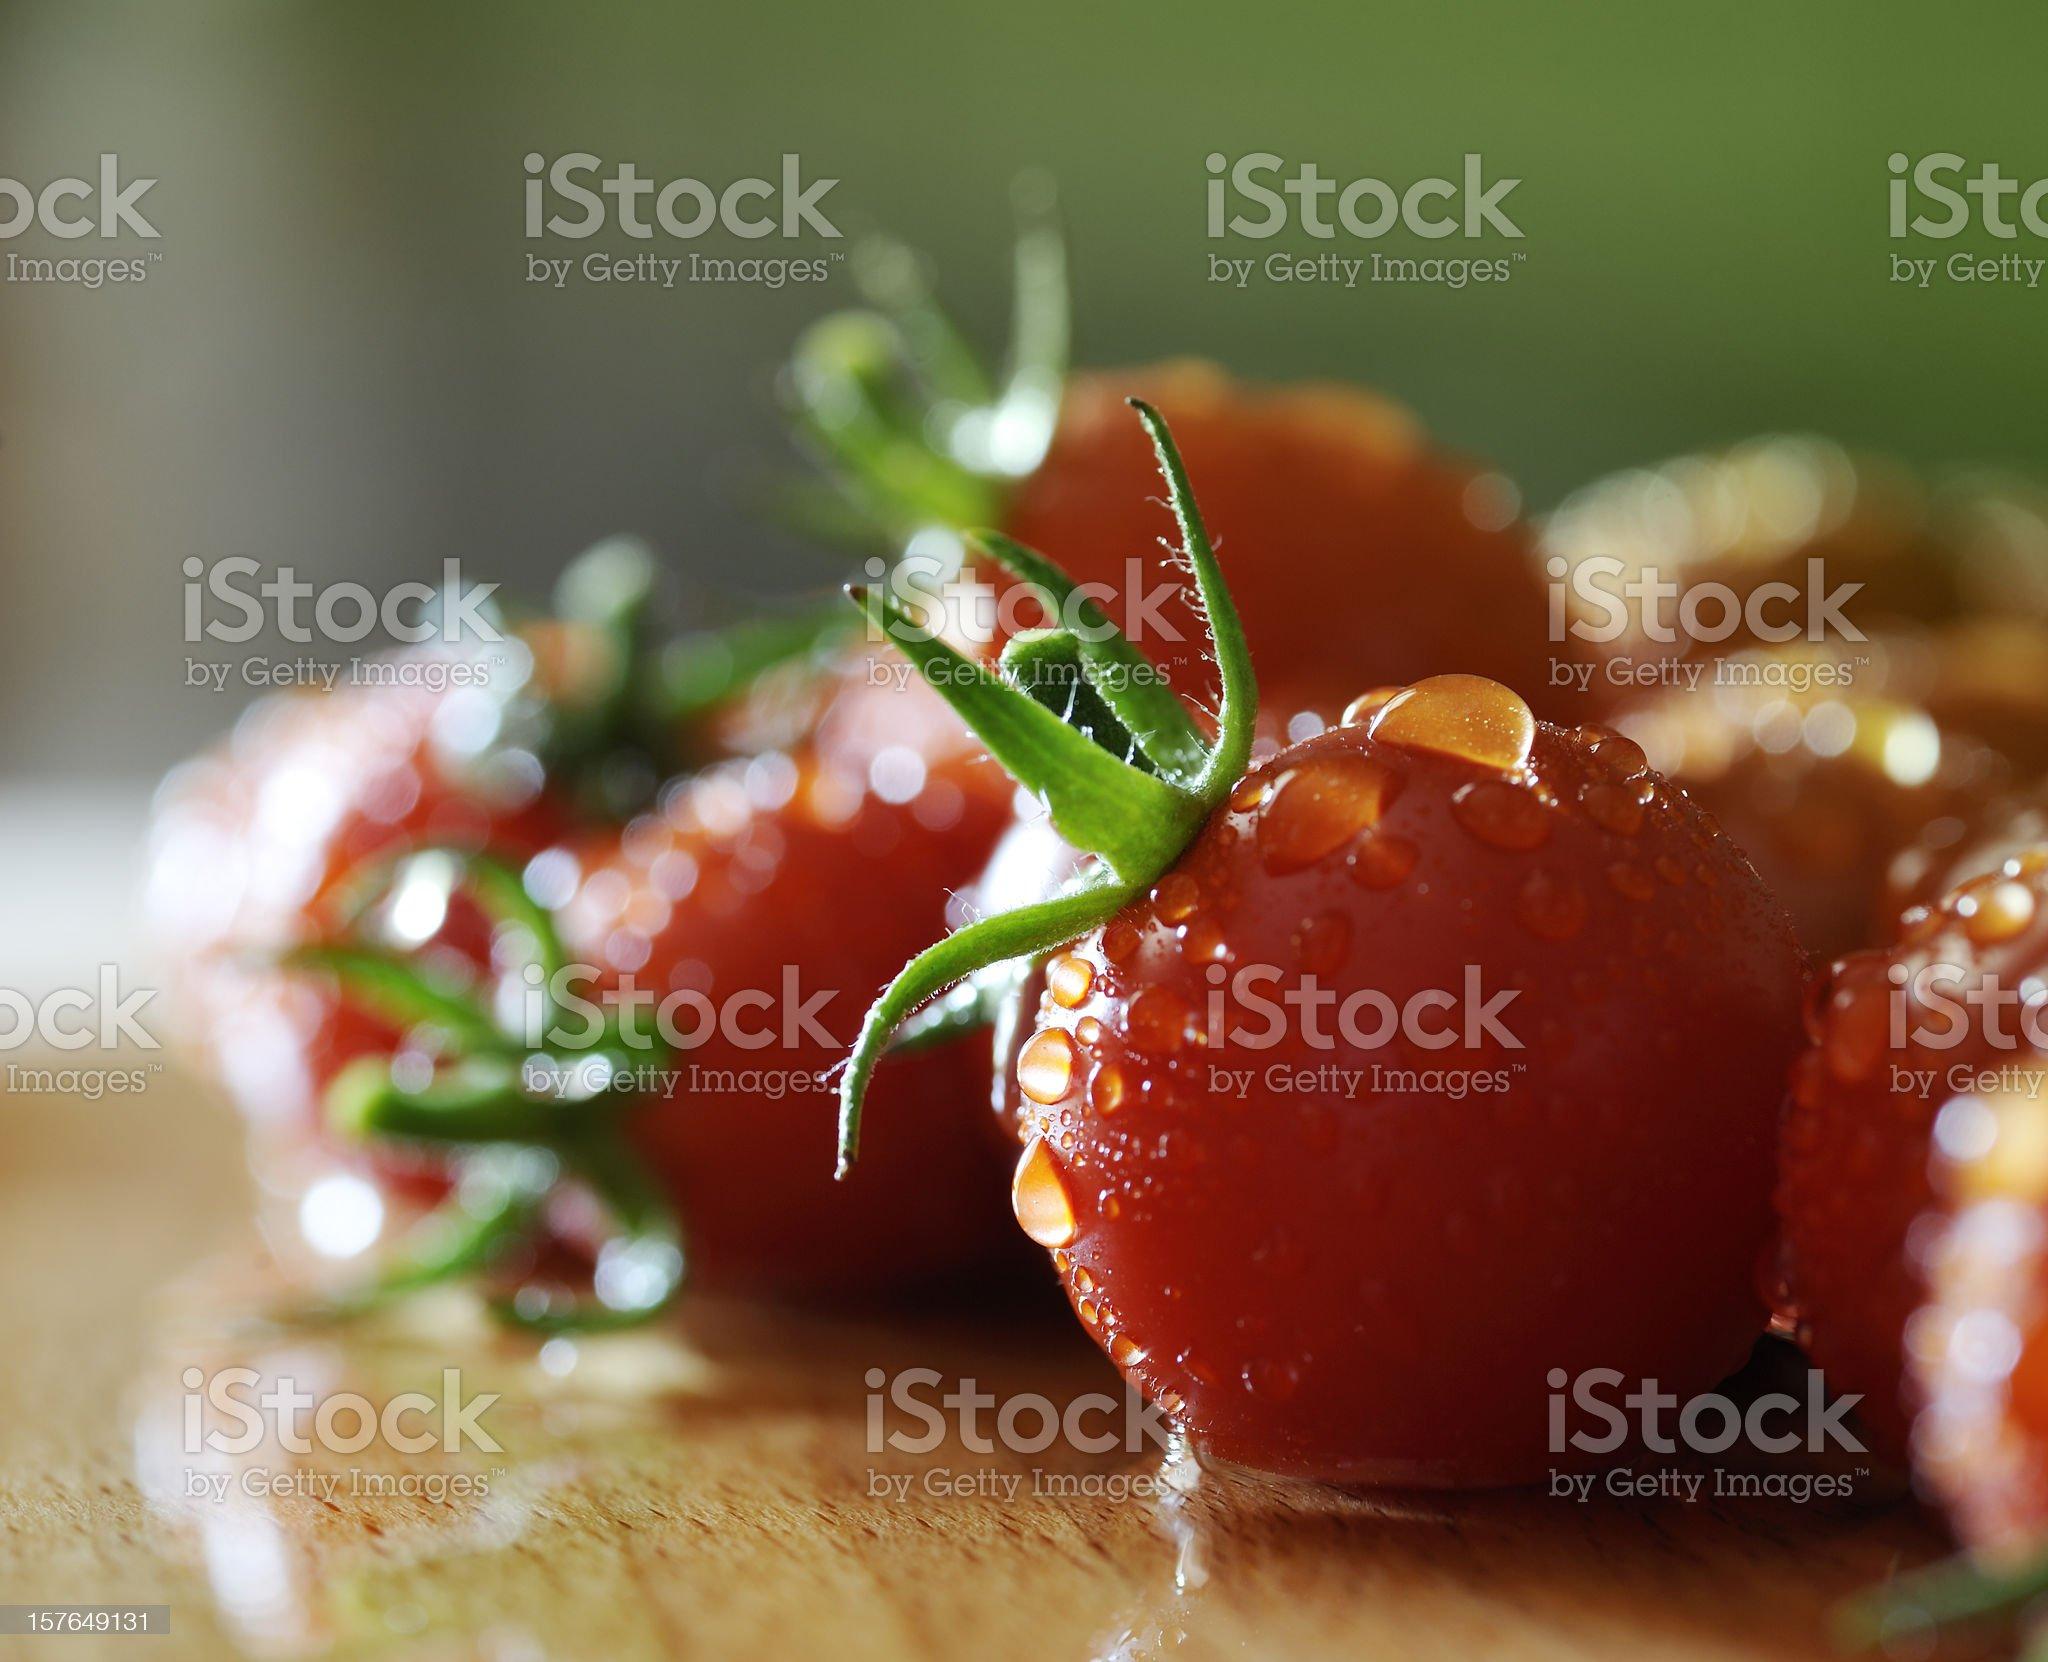 Tomatoes close up royalty-free stock photo